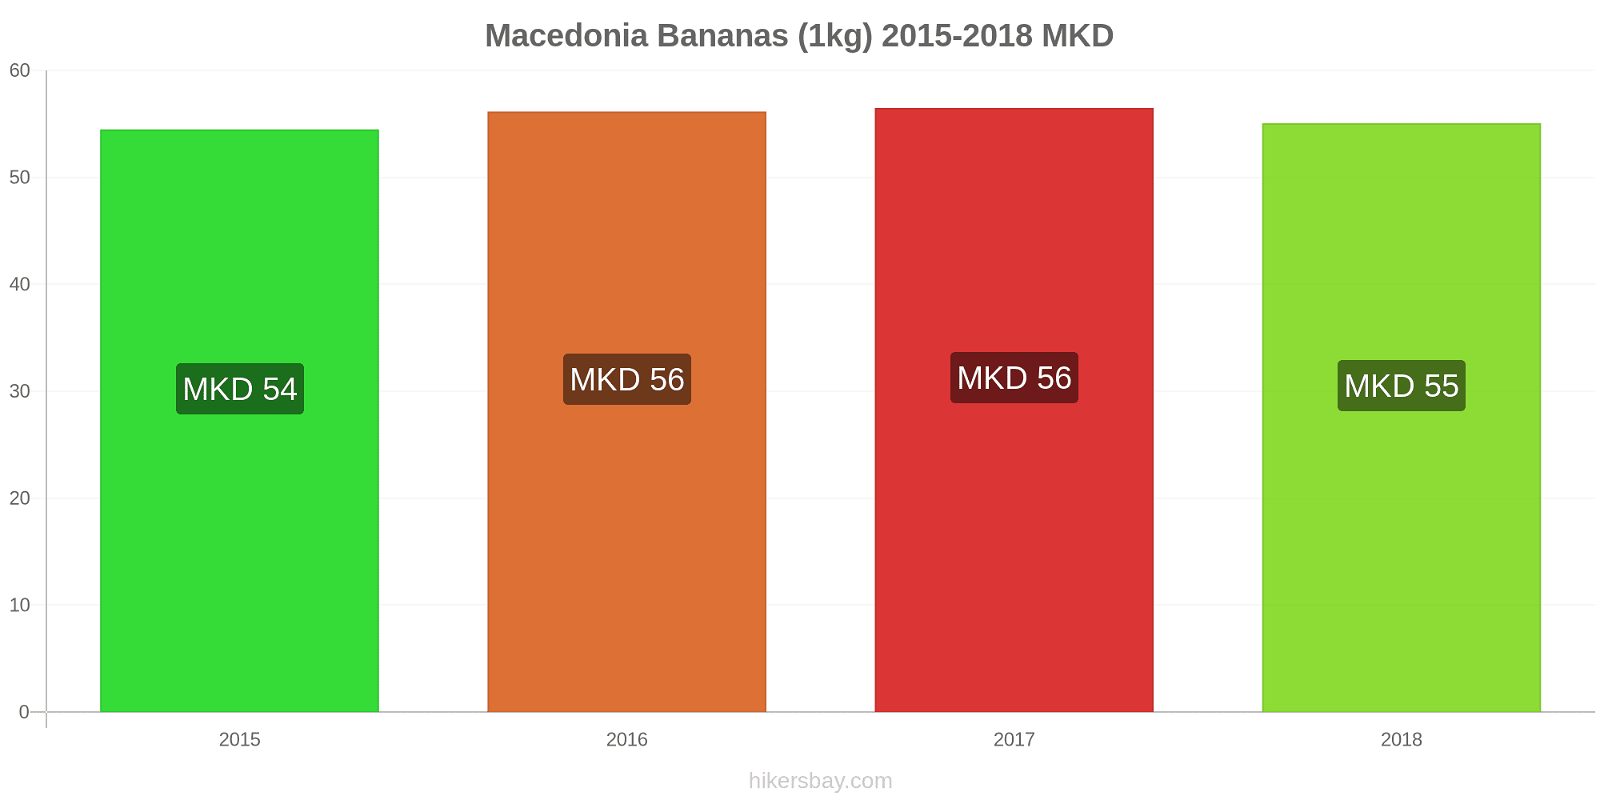 Macedonia price changes Bananas (1kg) hikersbay.com